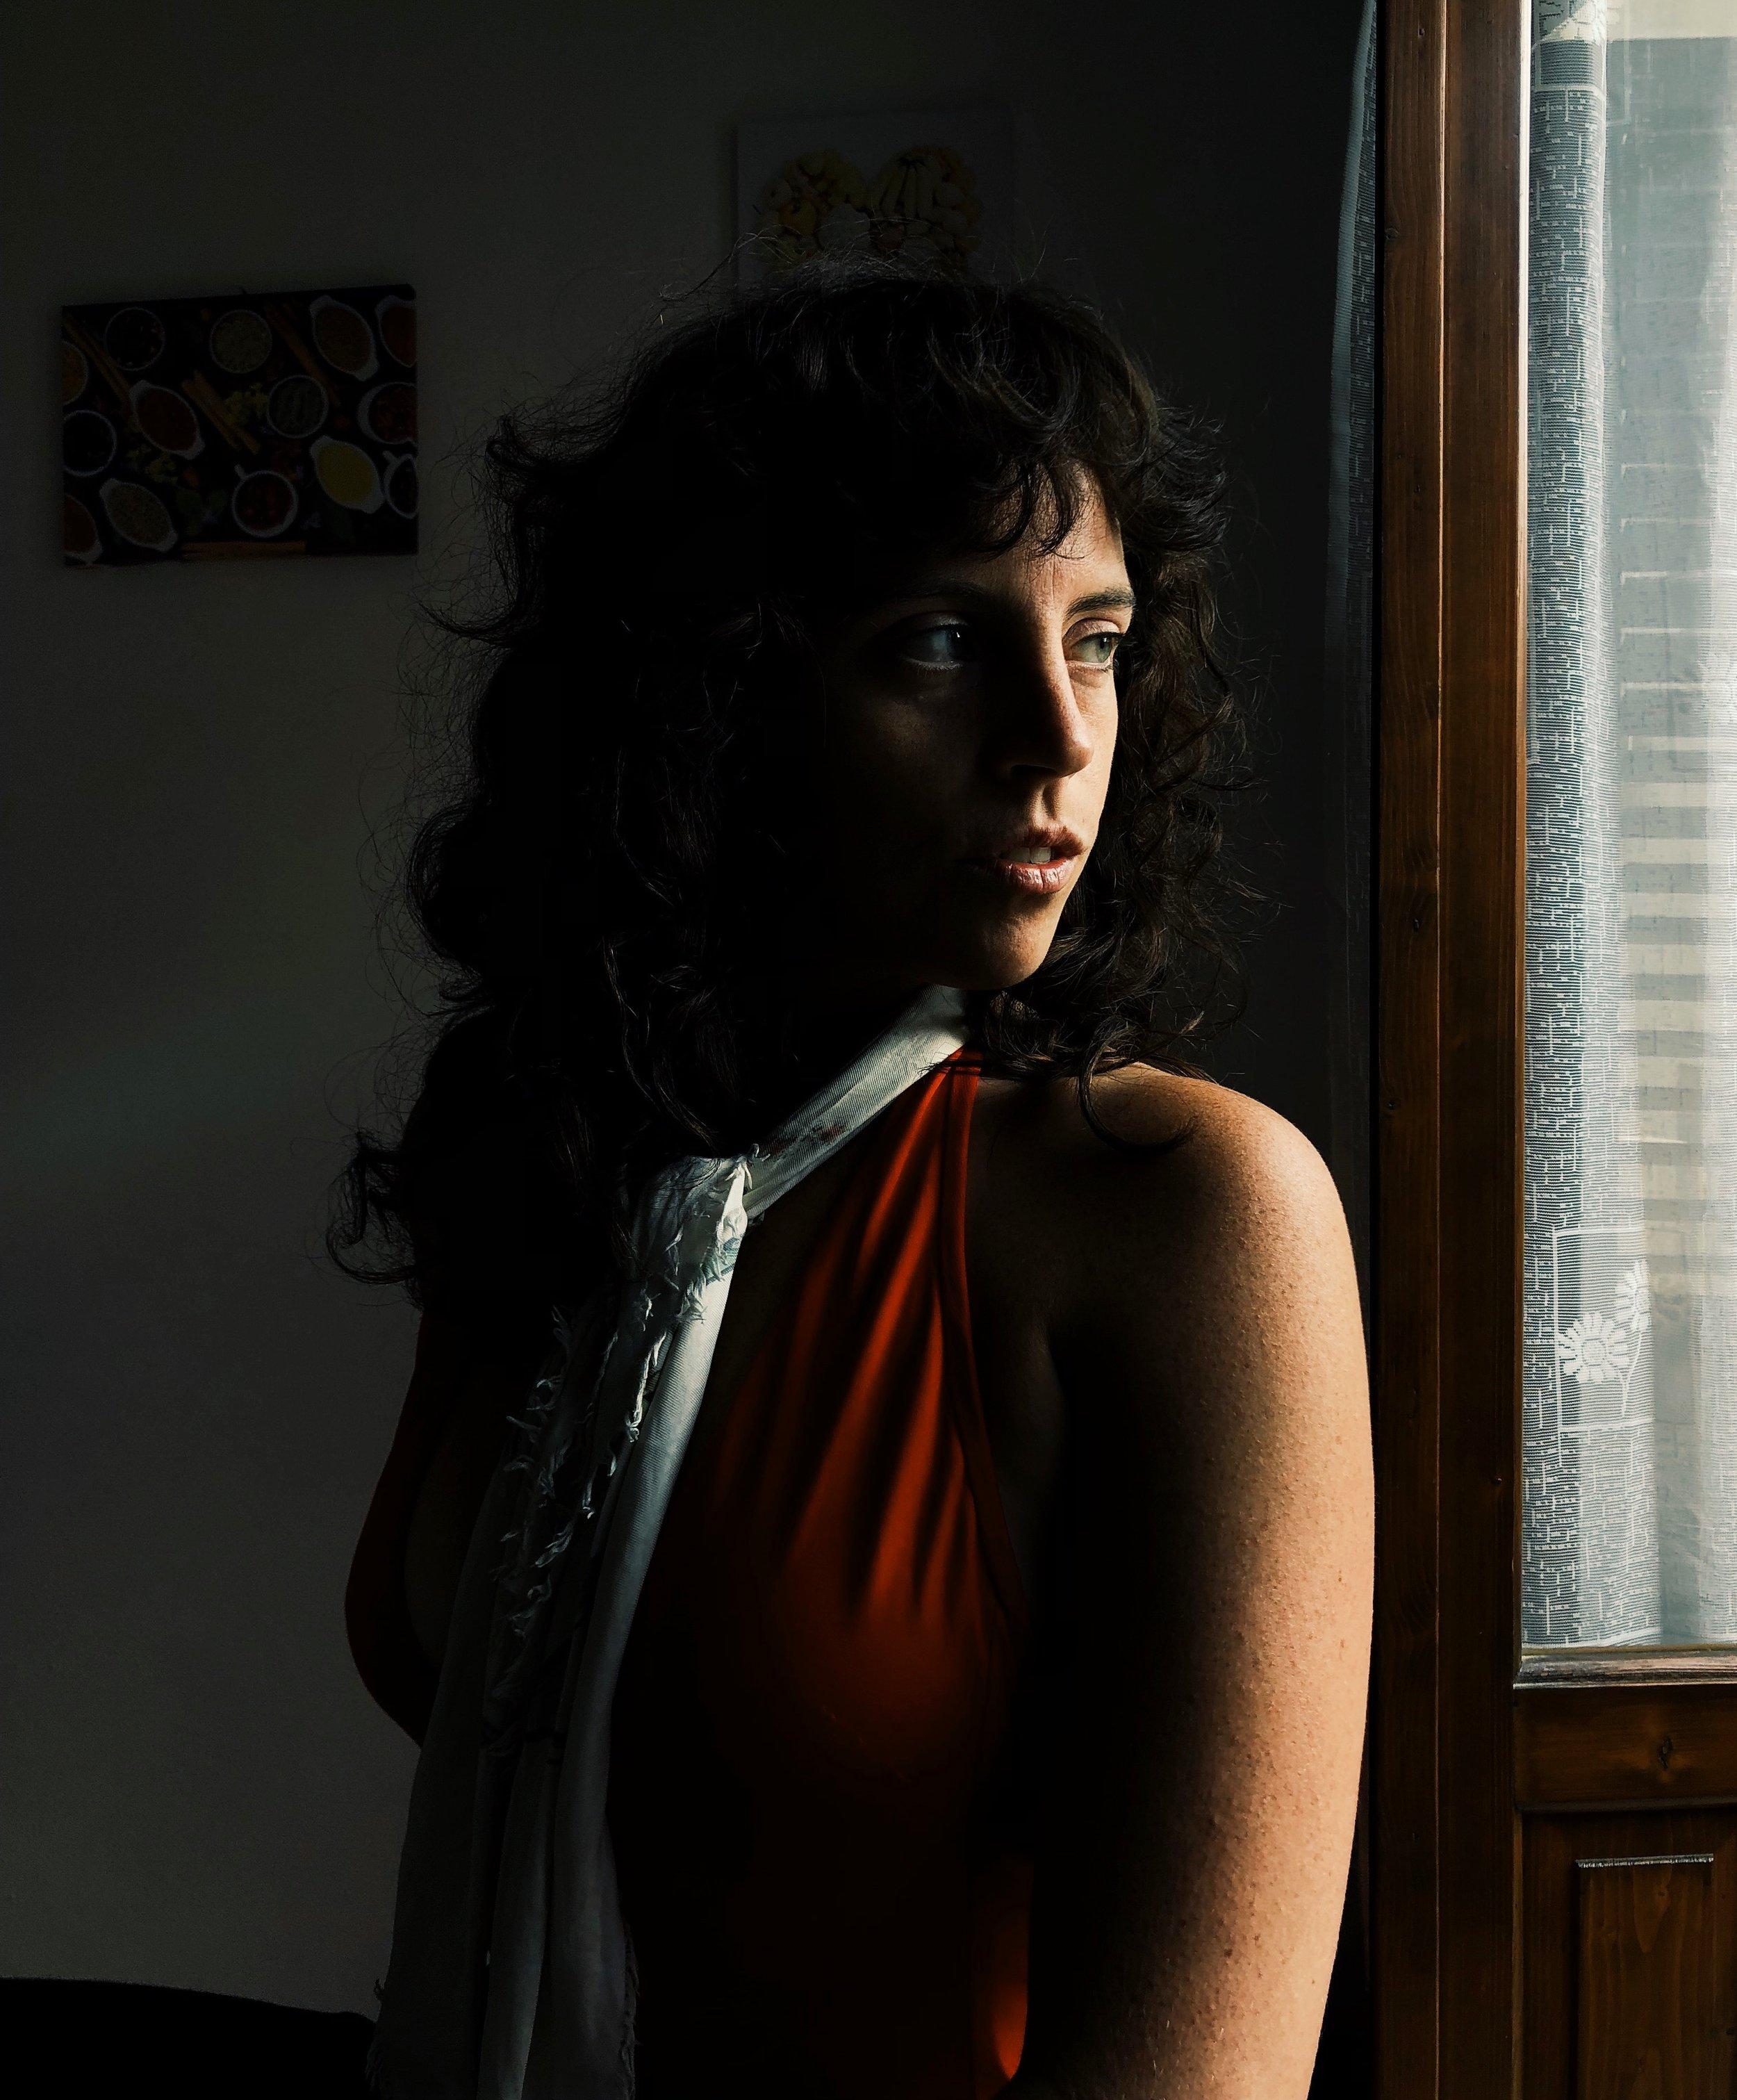 melanie odelle by elle wildhagen 3.JPG